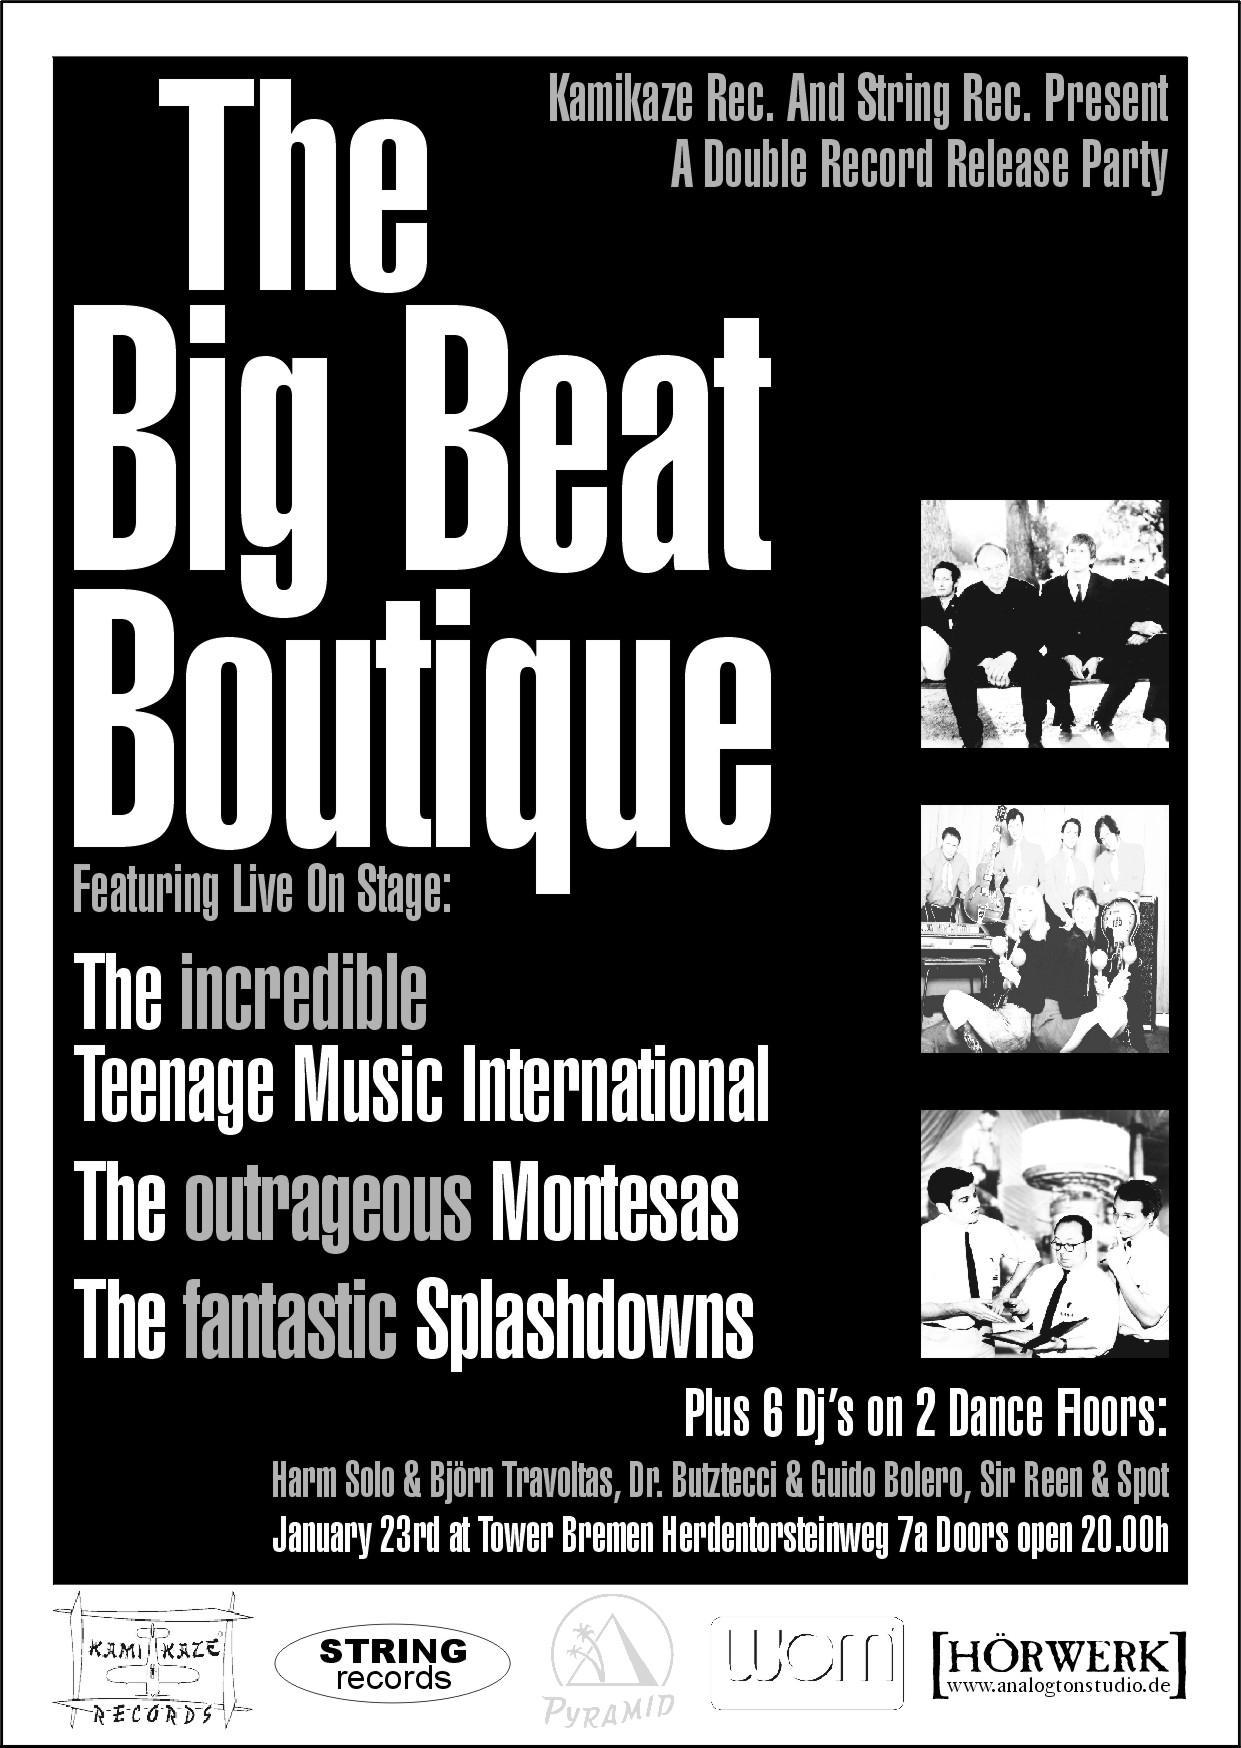 The splashdowns tourdaten vergangenheit for The beat boutique